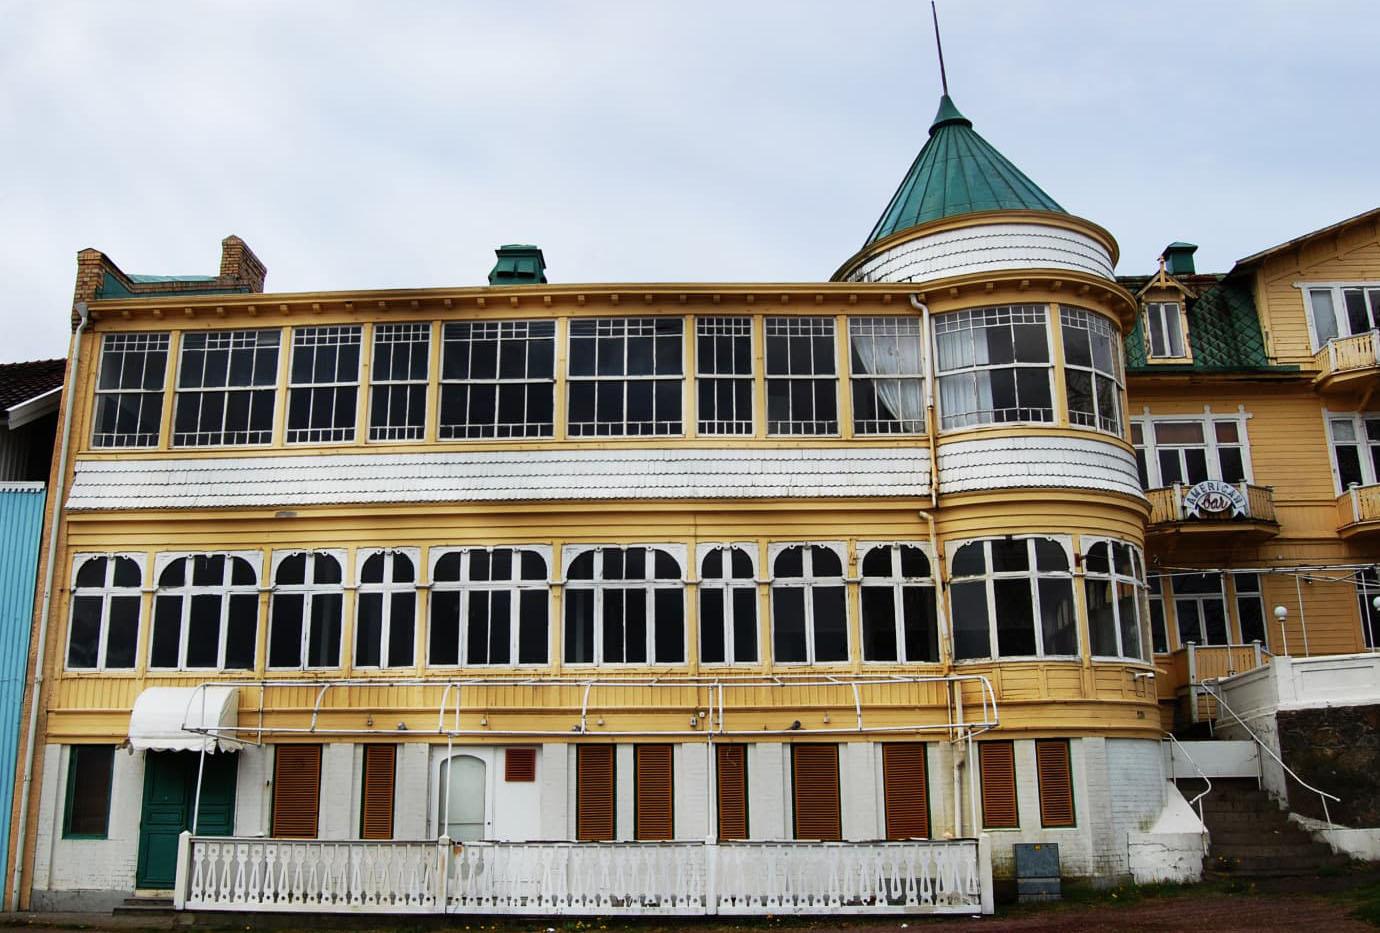 turisthotellet i Marstrand